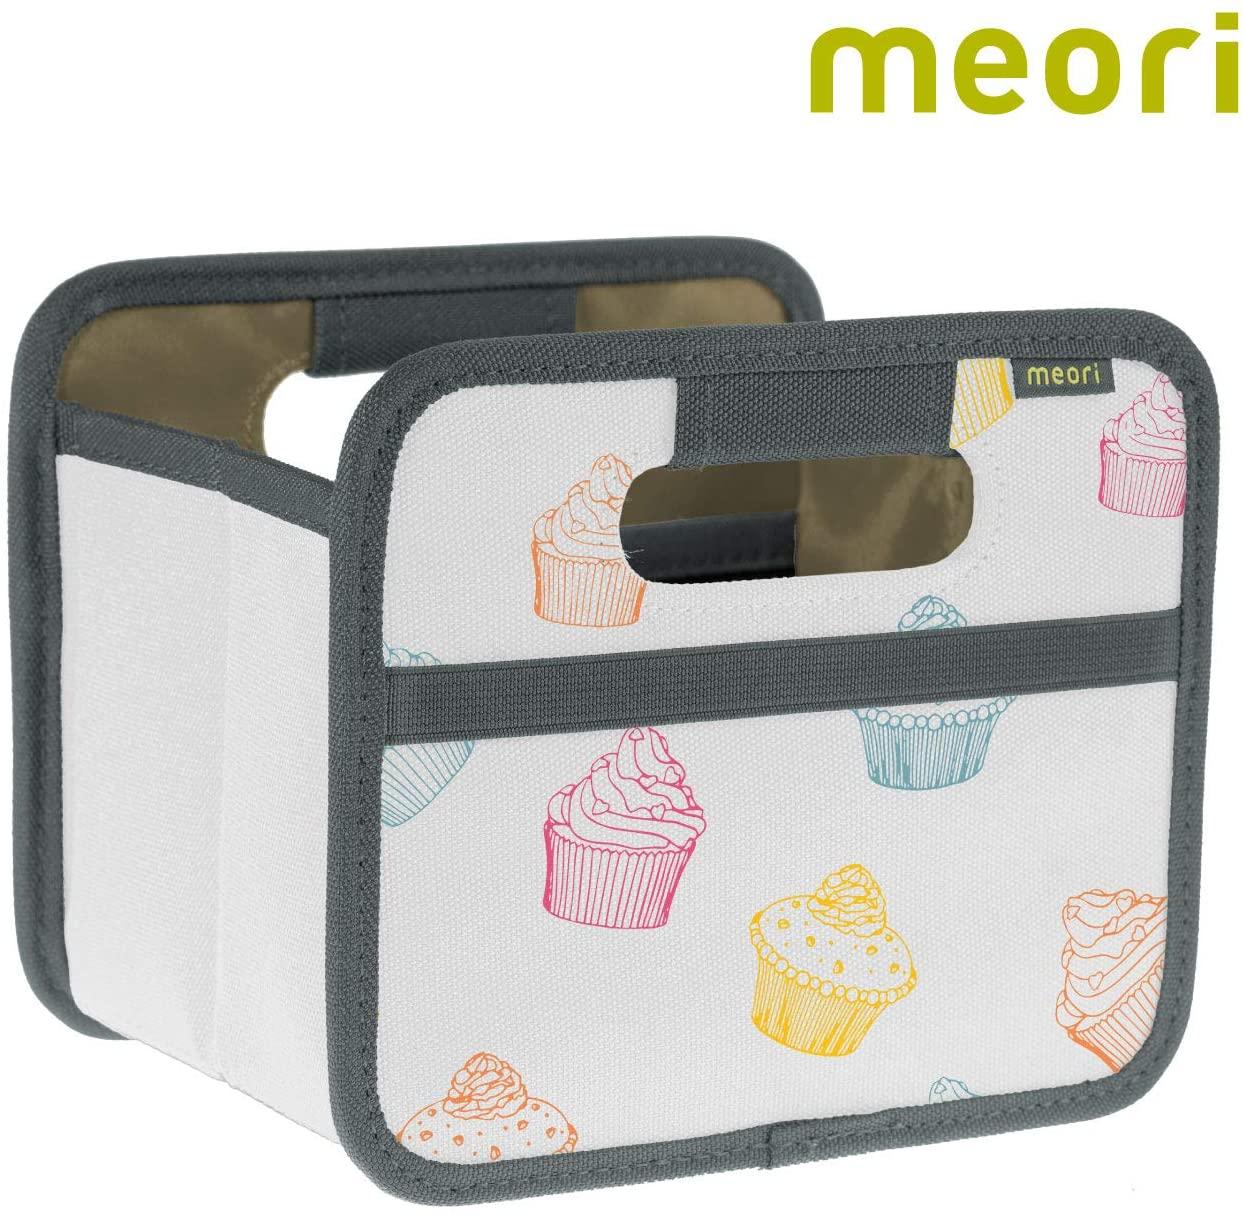 meori Mini Foldable Storage Box, 1-Pack, Cupcake